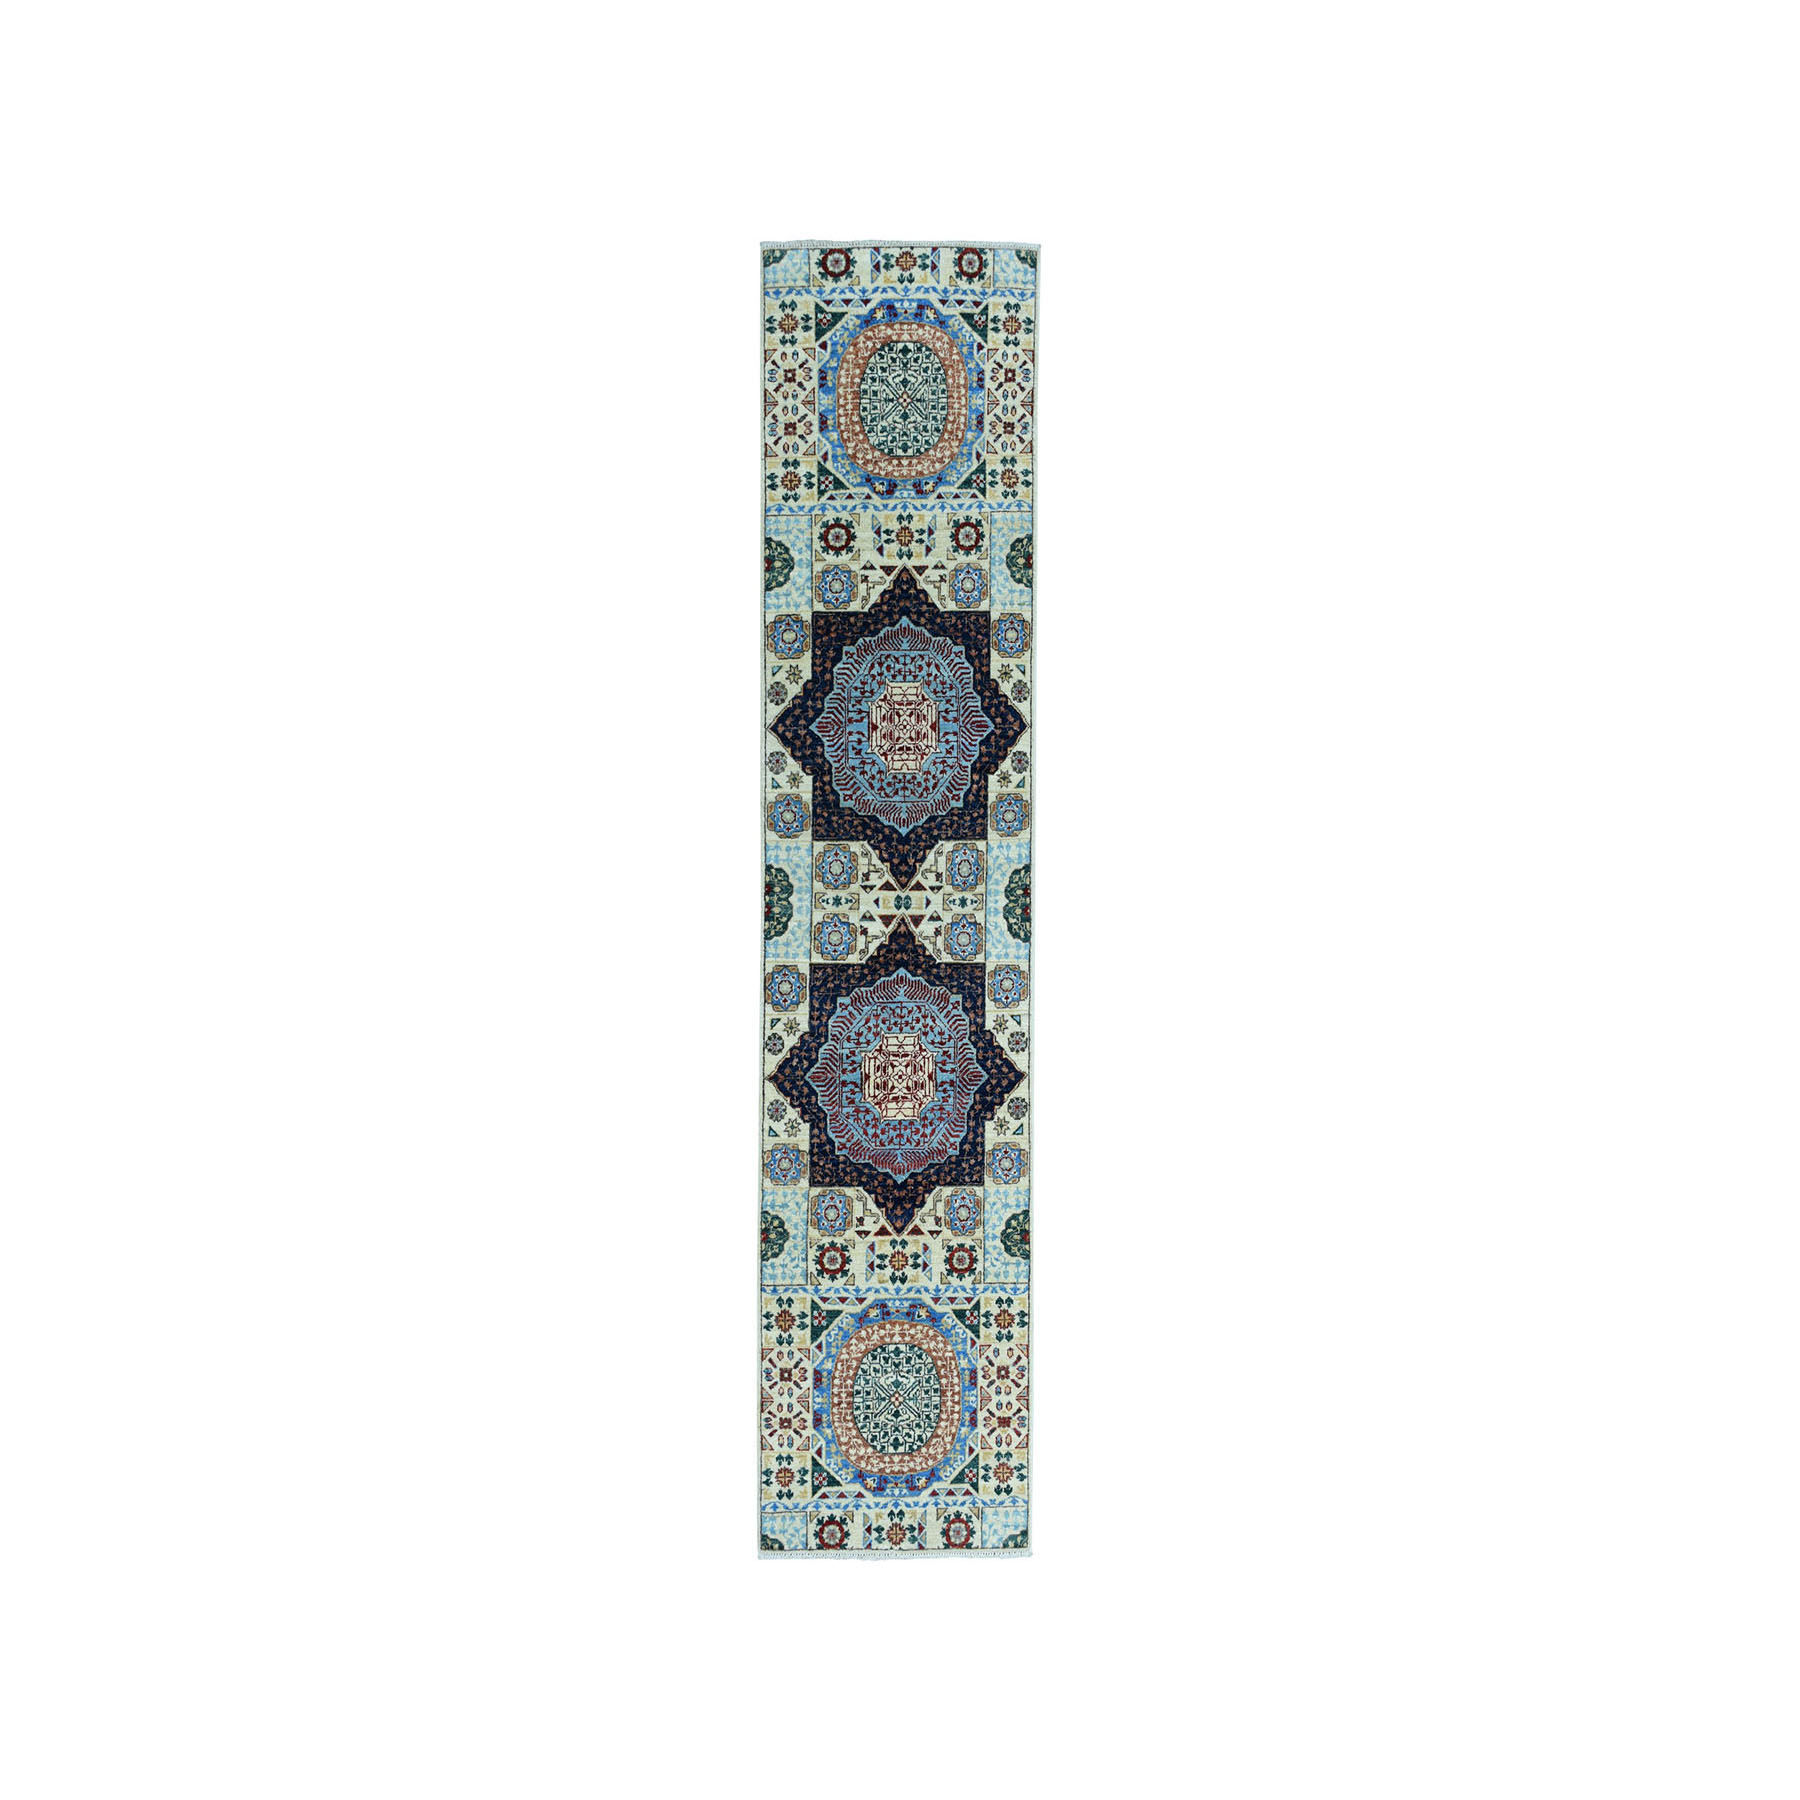 "2'7""x10'2"" Colorful Peshawar Mamluk Design Pure Wool Runner Hand-Knotted Oriental Rug"